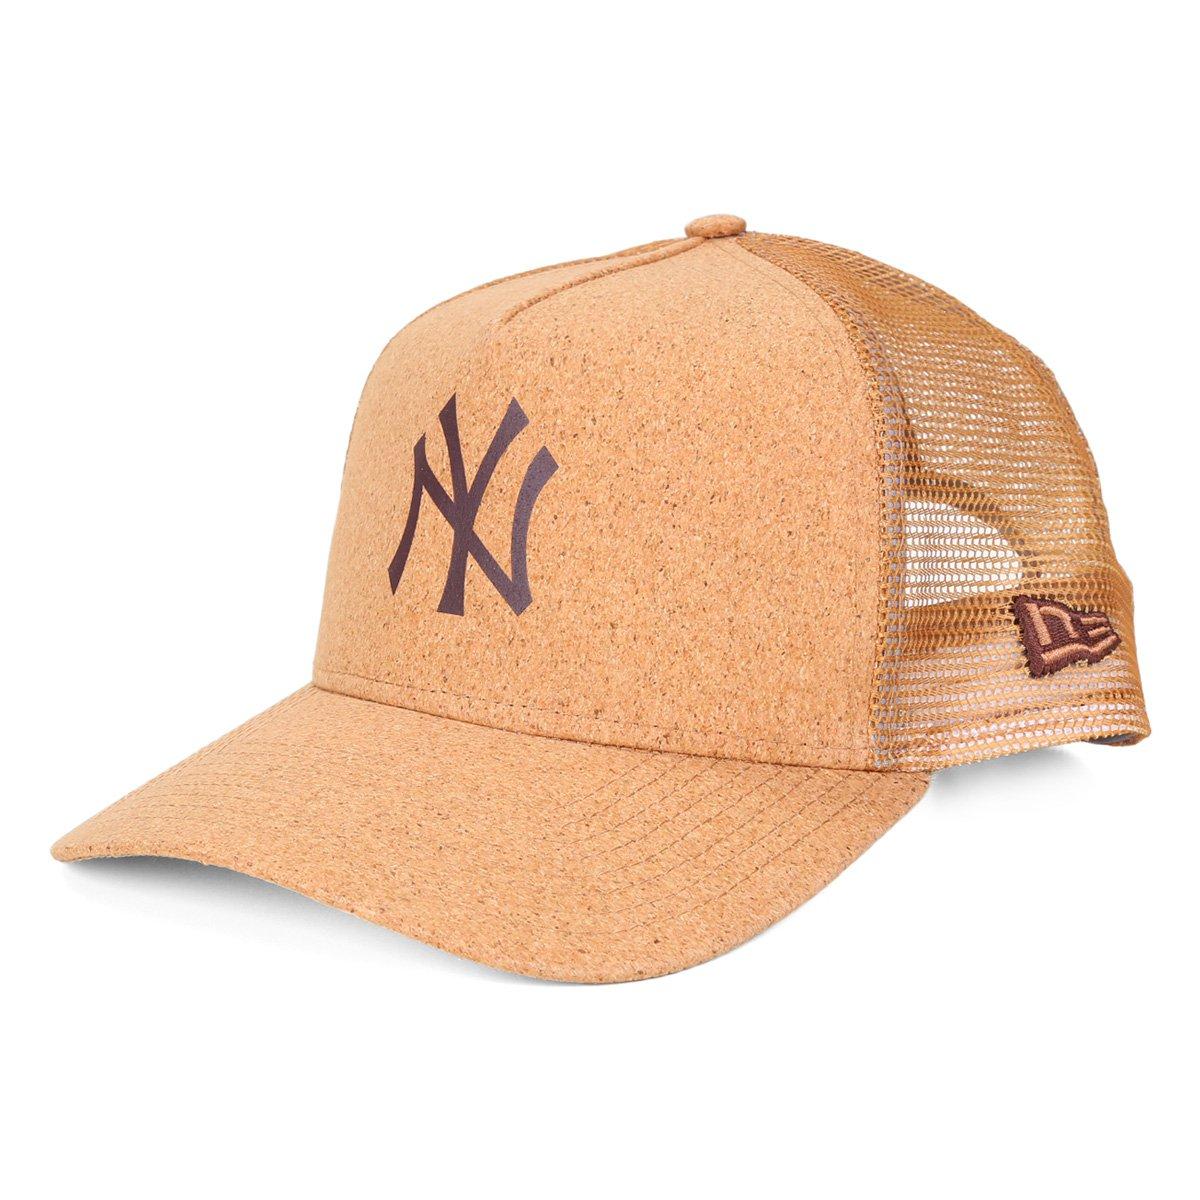 Boné New Era NBA New York Yankees Aba Curva Snapback 940 Summer Cork